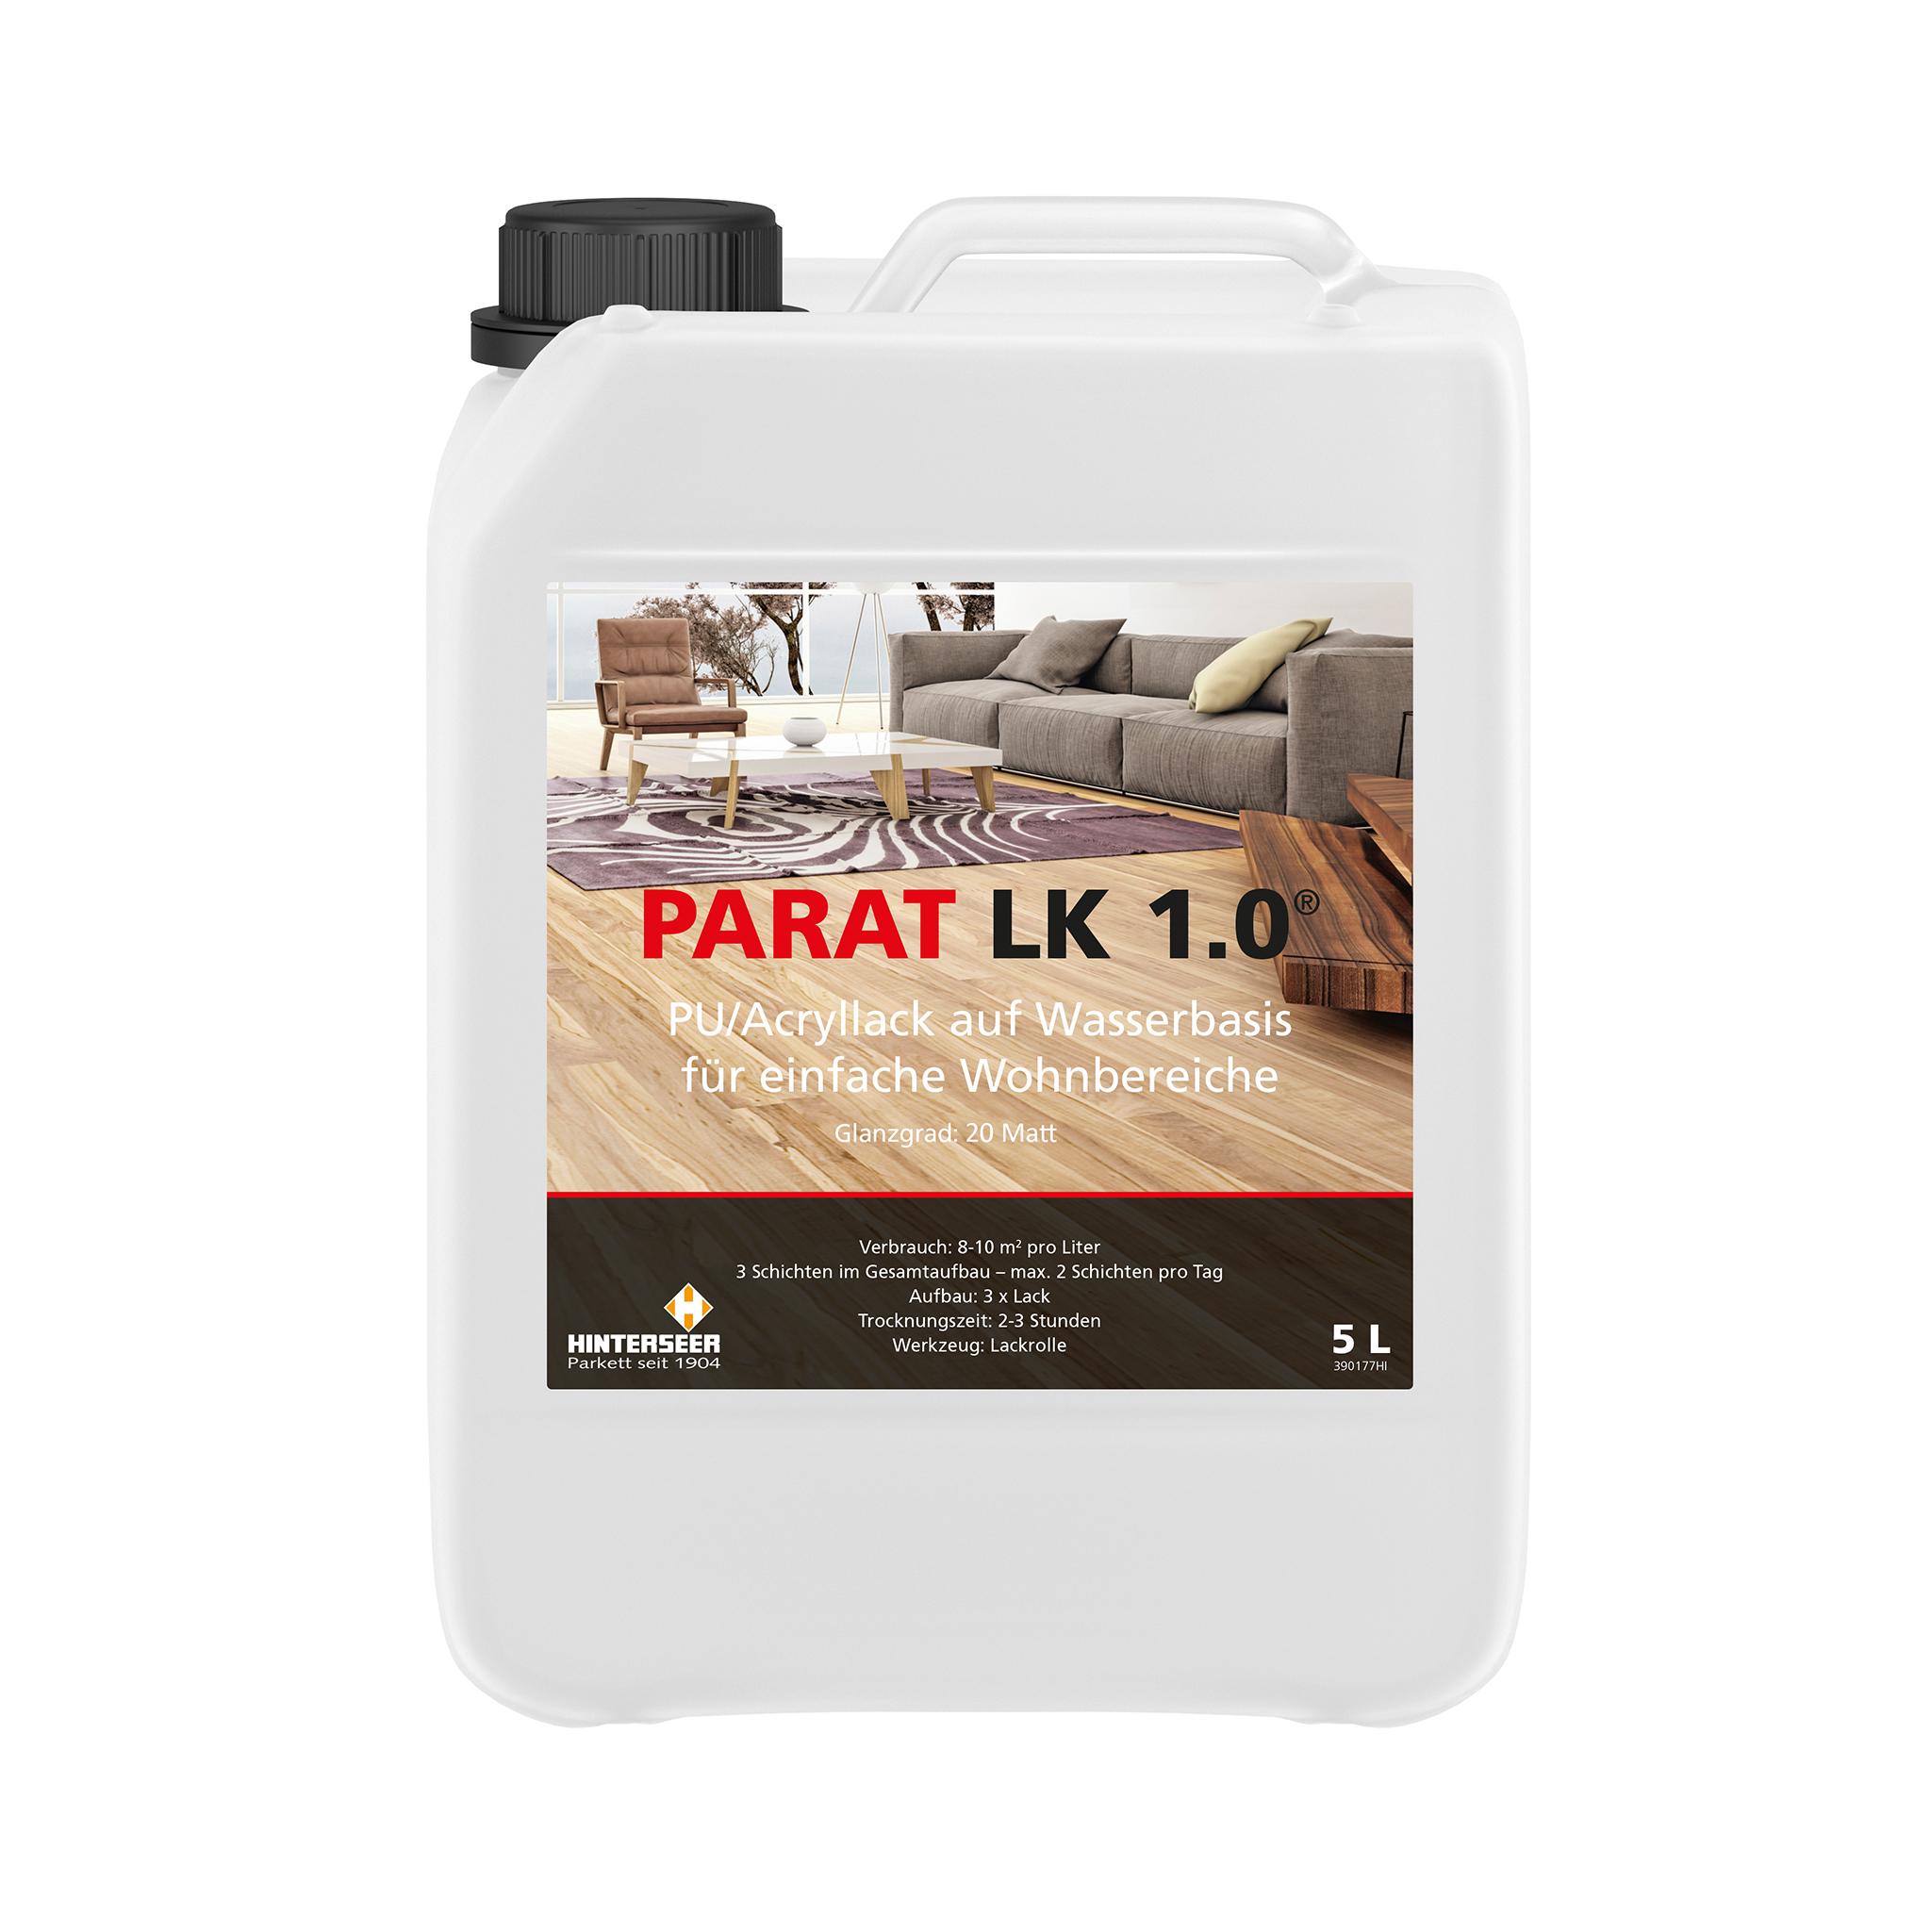 PARAT LK 1.0 Parkettlack 5 Ltr.